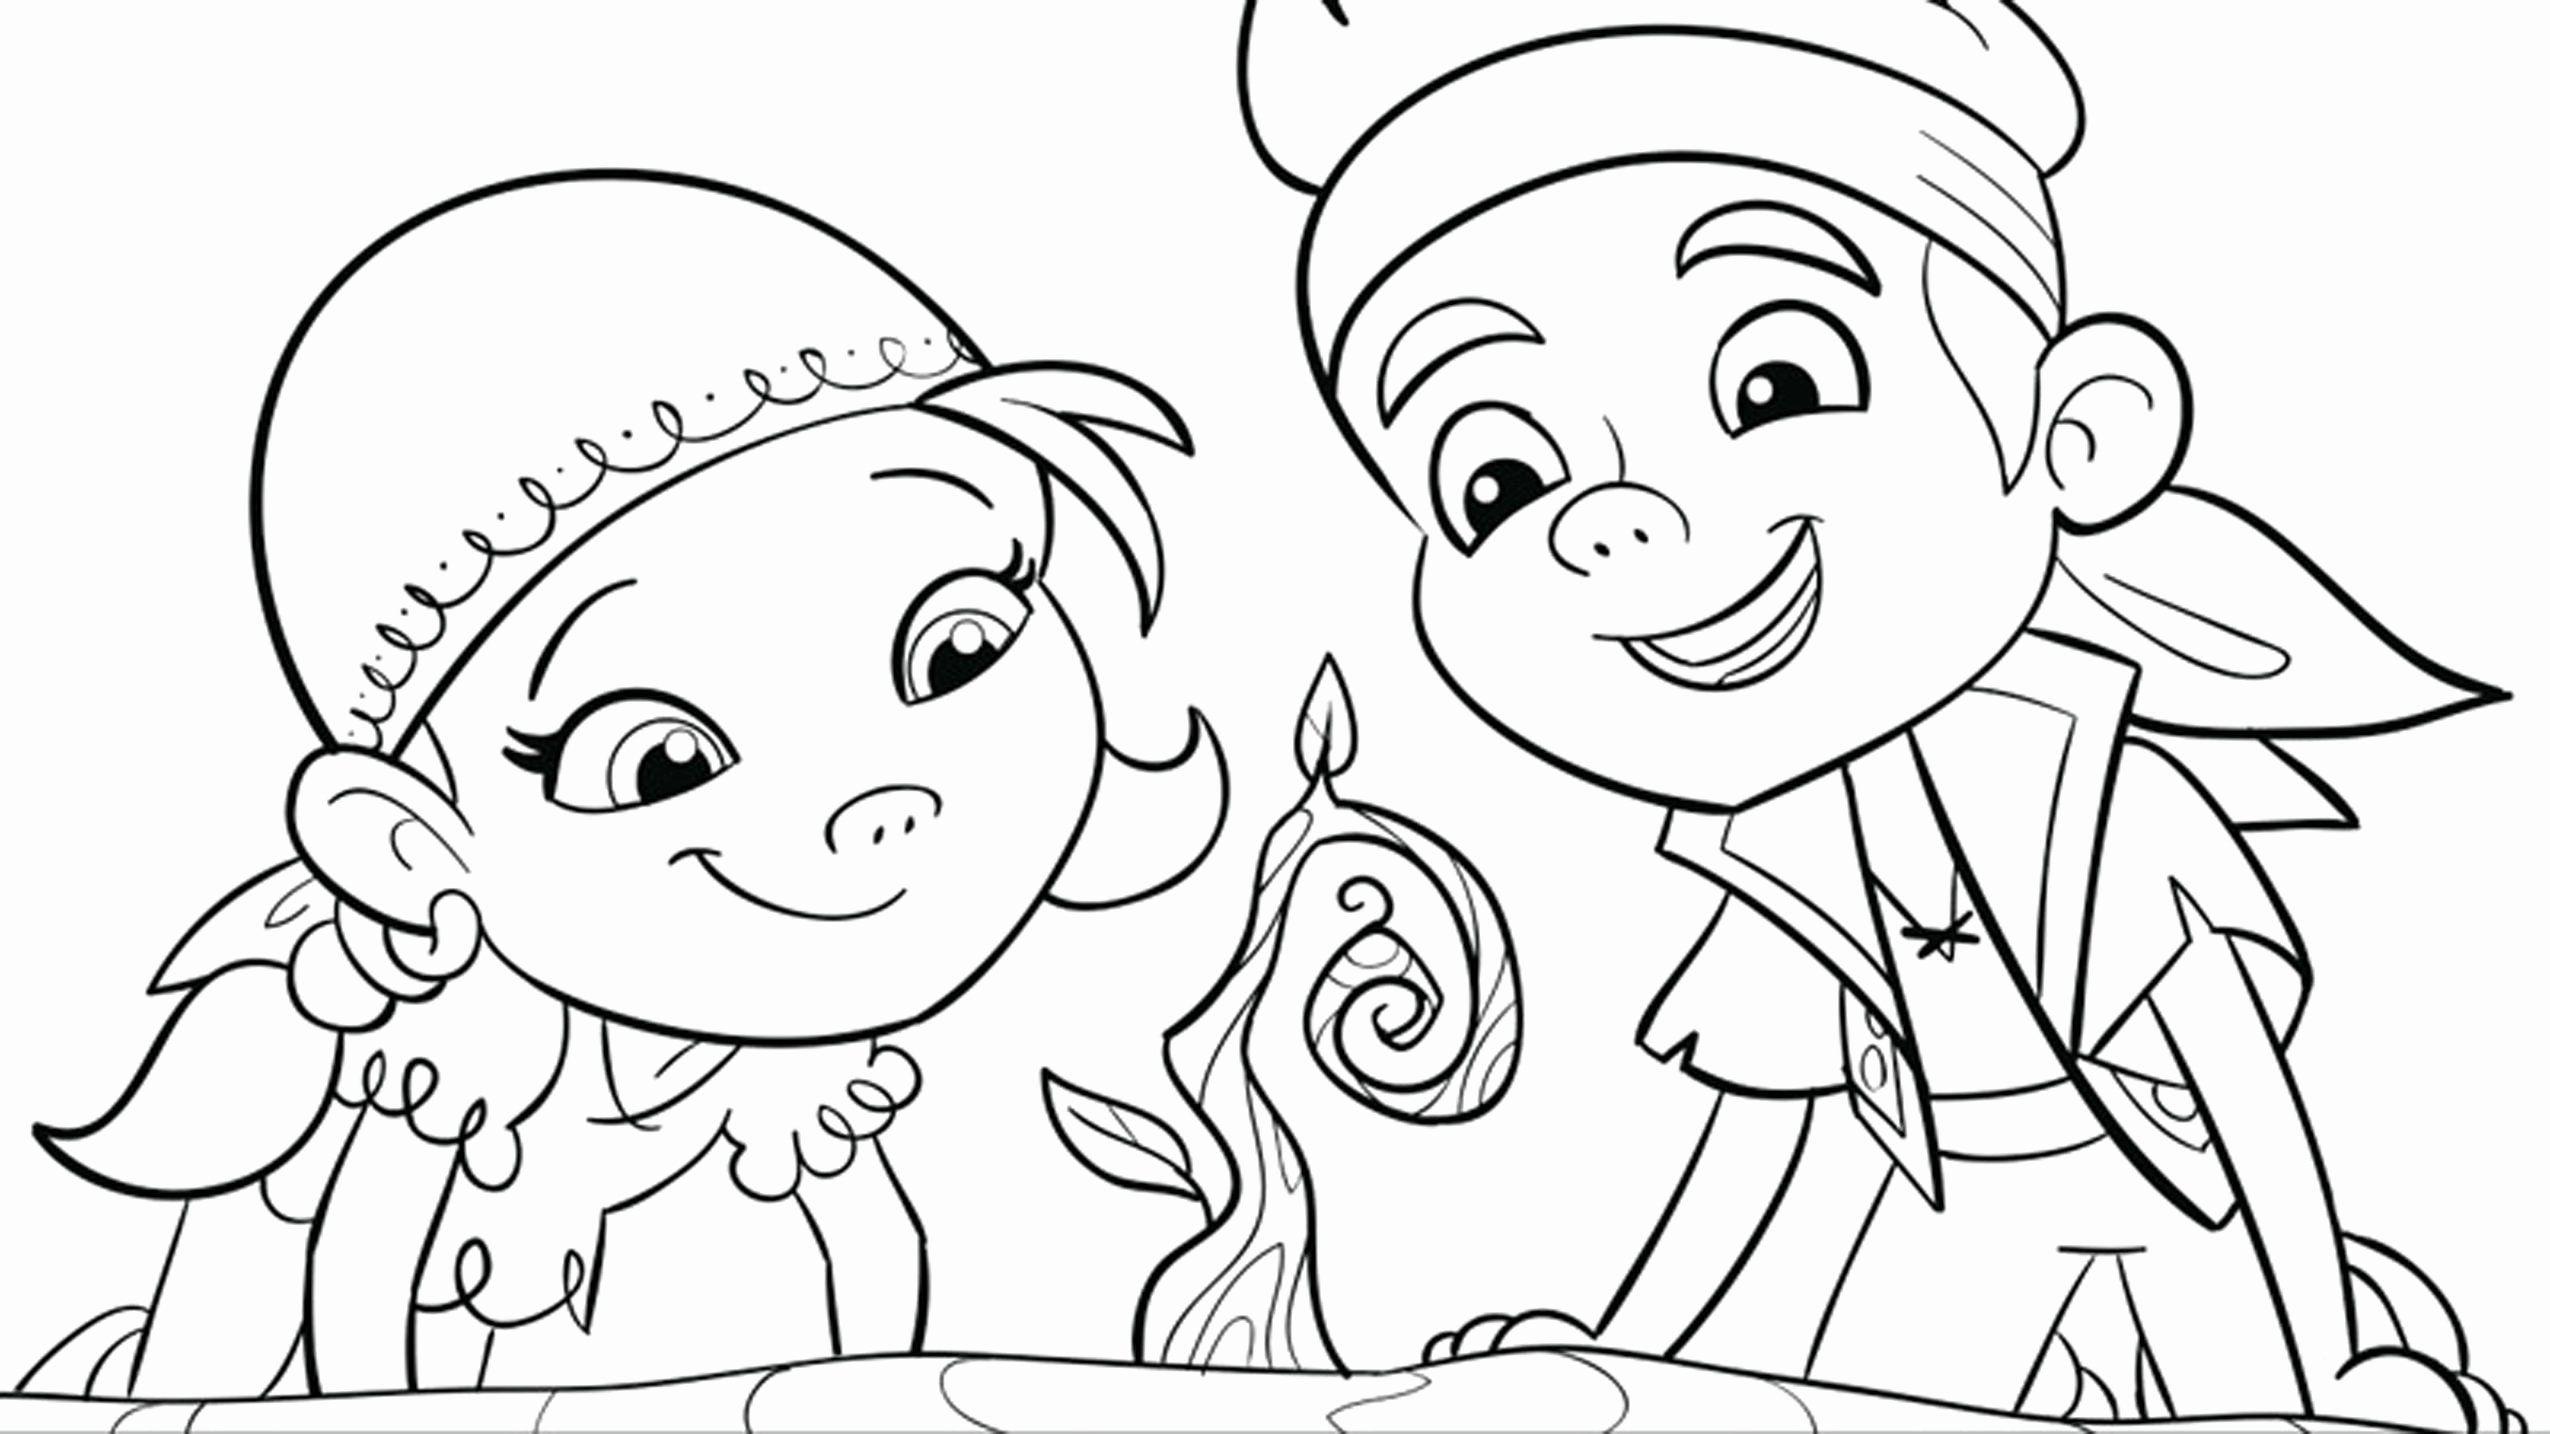 Disney Jr Printable Coloring Pages Beautiful Free Printable Disney Coloring Pages To Print In 2020 Disney Coloring Pages Cute Coloring Pages Free Disney Coloring Pages